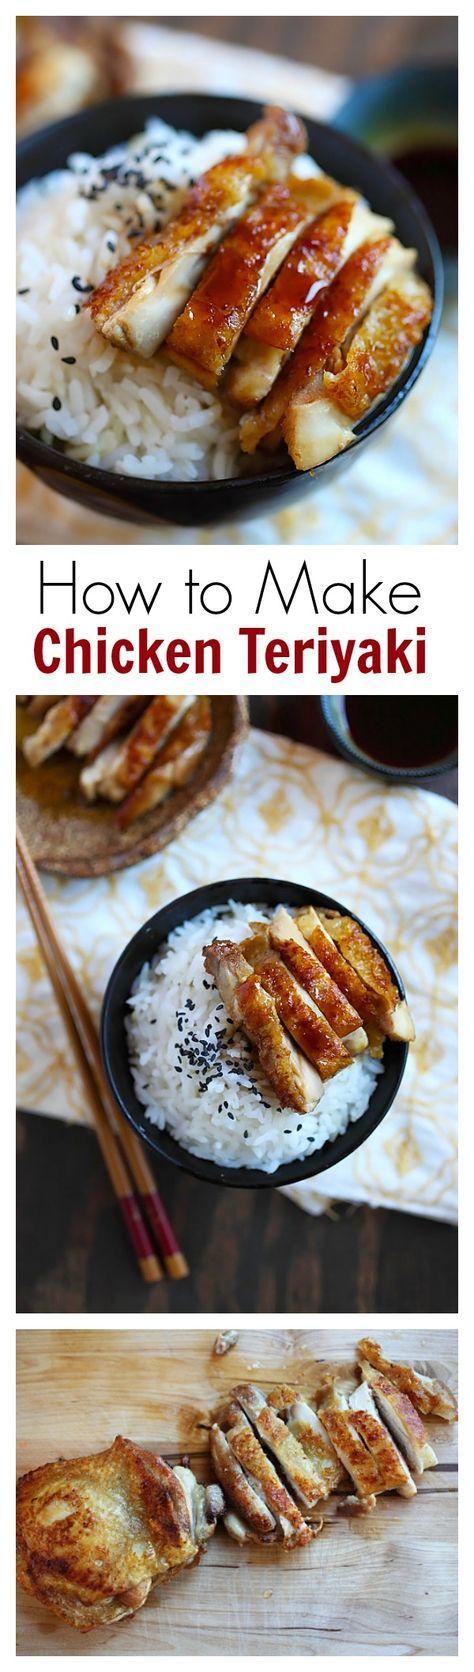 How to make chicken teriyaki? EASY recipe for teriyaki sauce plus chicken teriyaki that tastes like Japanese restaurants   rasamalaysia.com @rasamalaysia